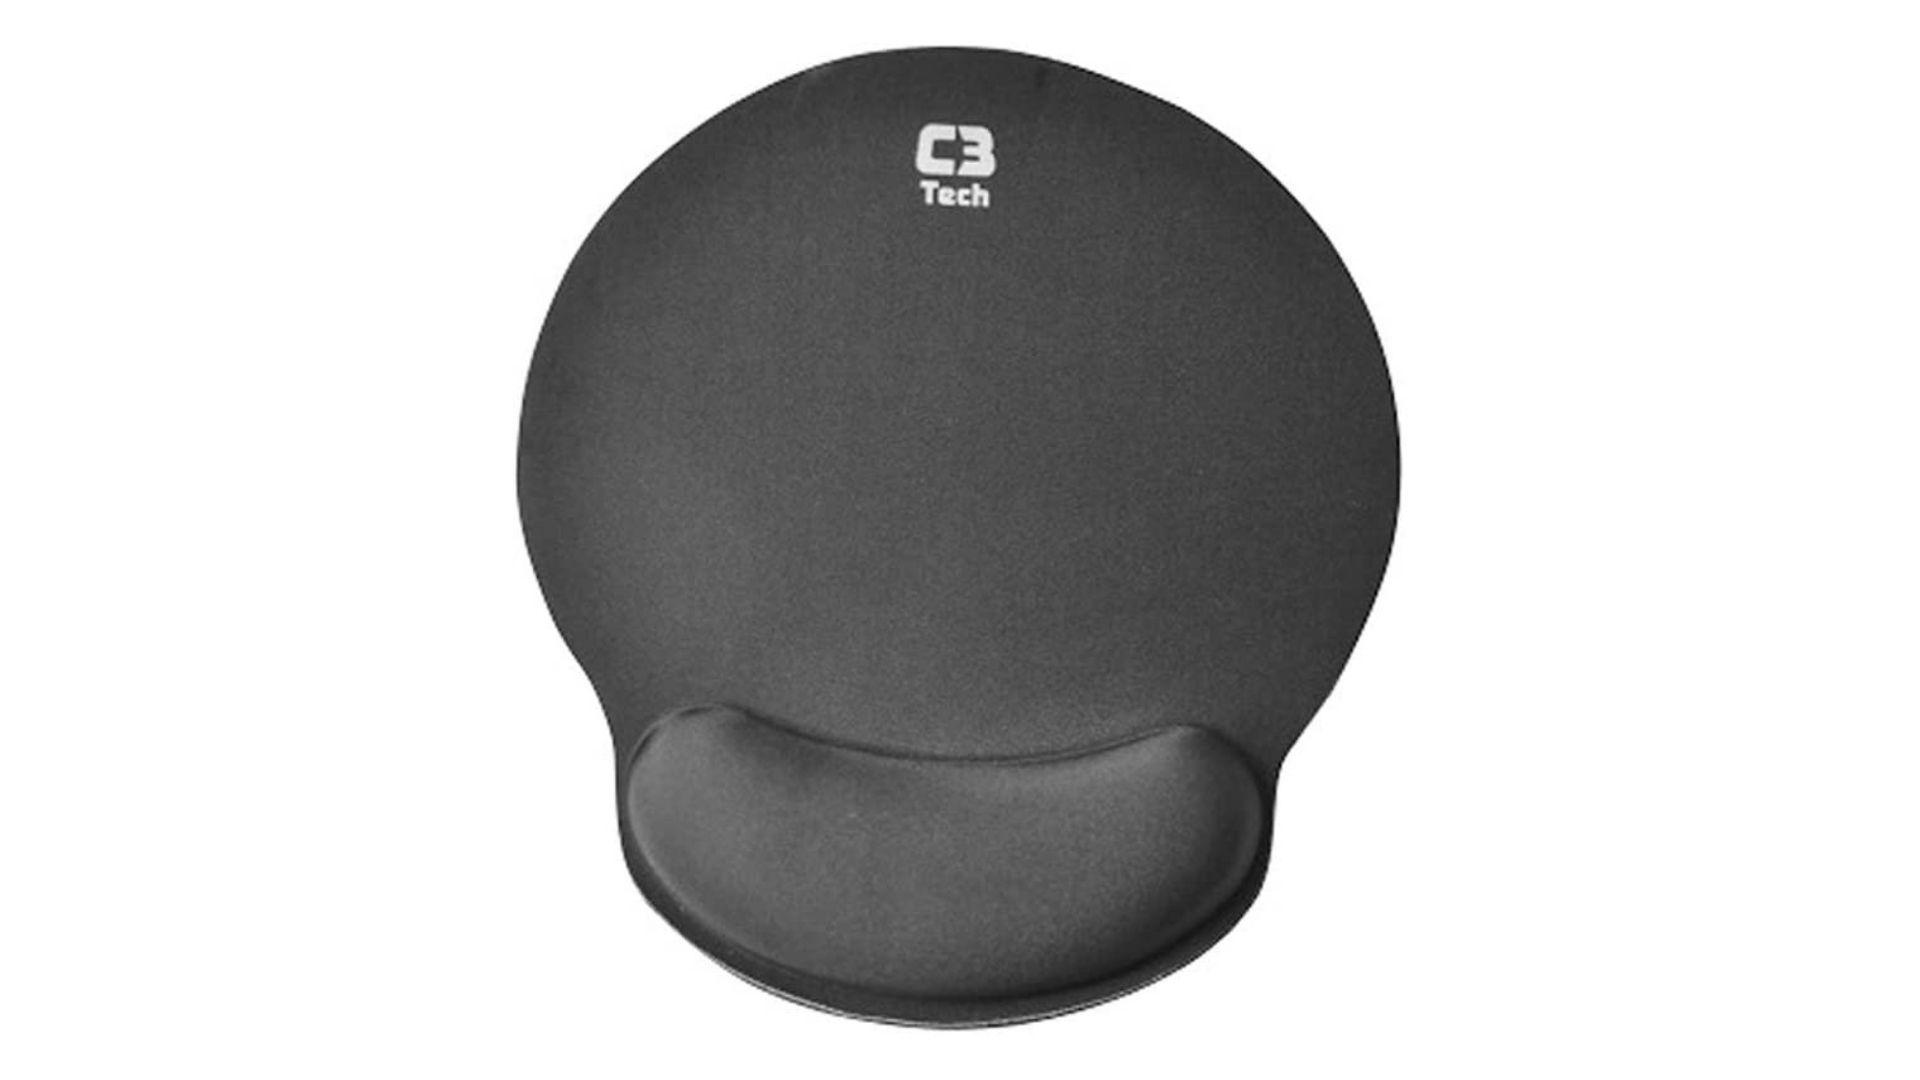 Mouse Pad C3TECH MP preto no fundo branco